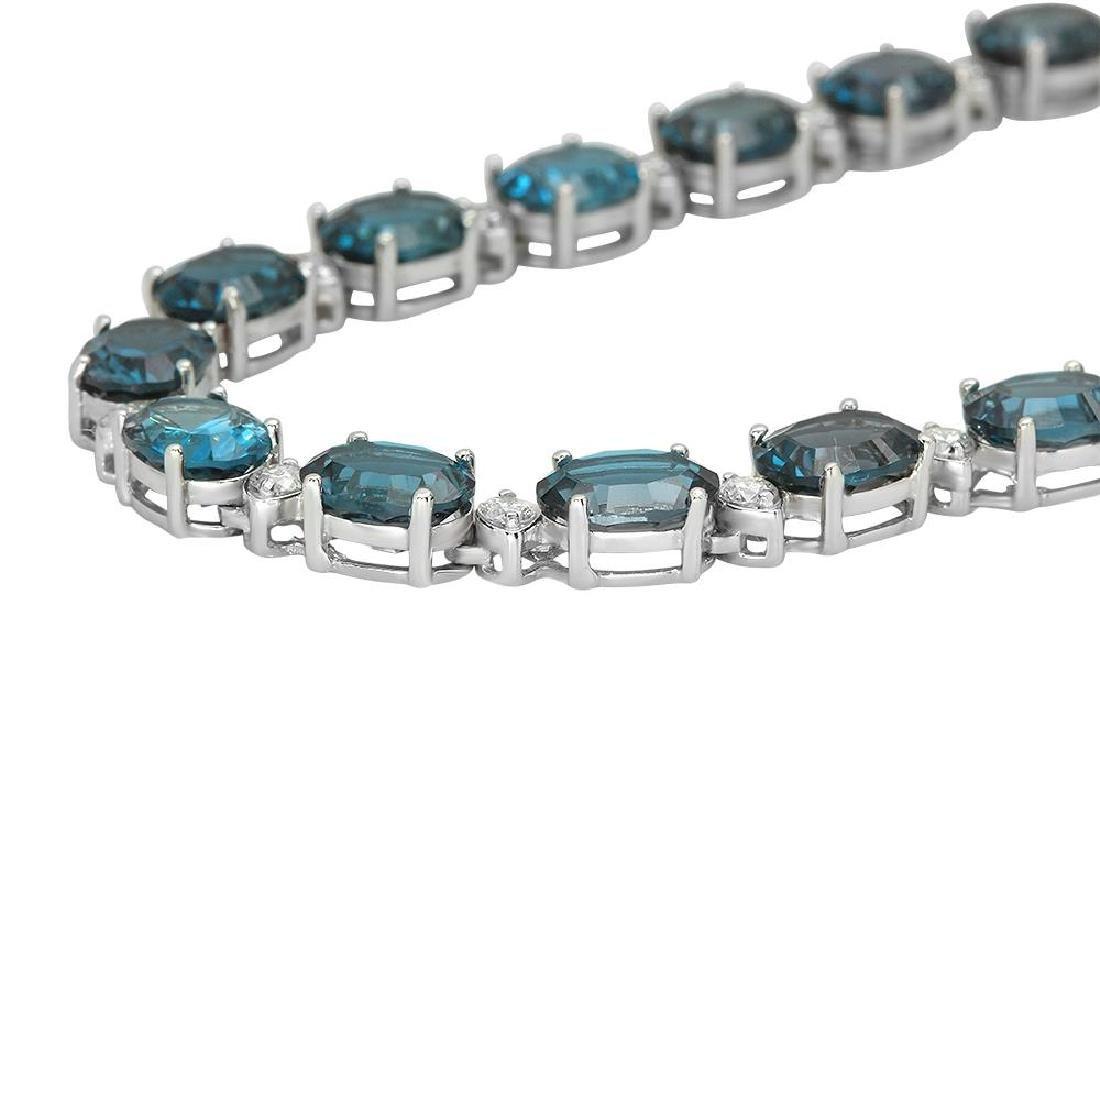 14K Gold 56.38ct Topaz 2.73ct Diamond Necklace - 2